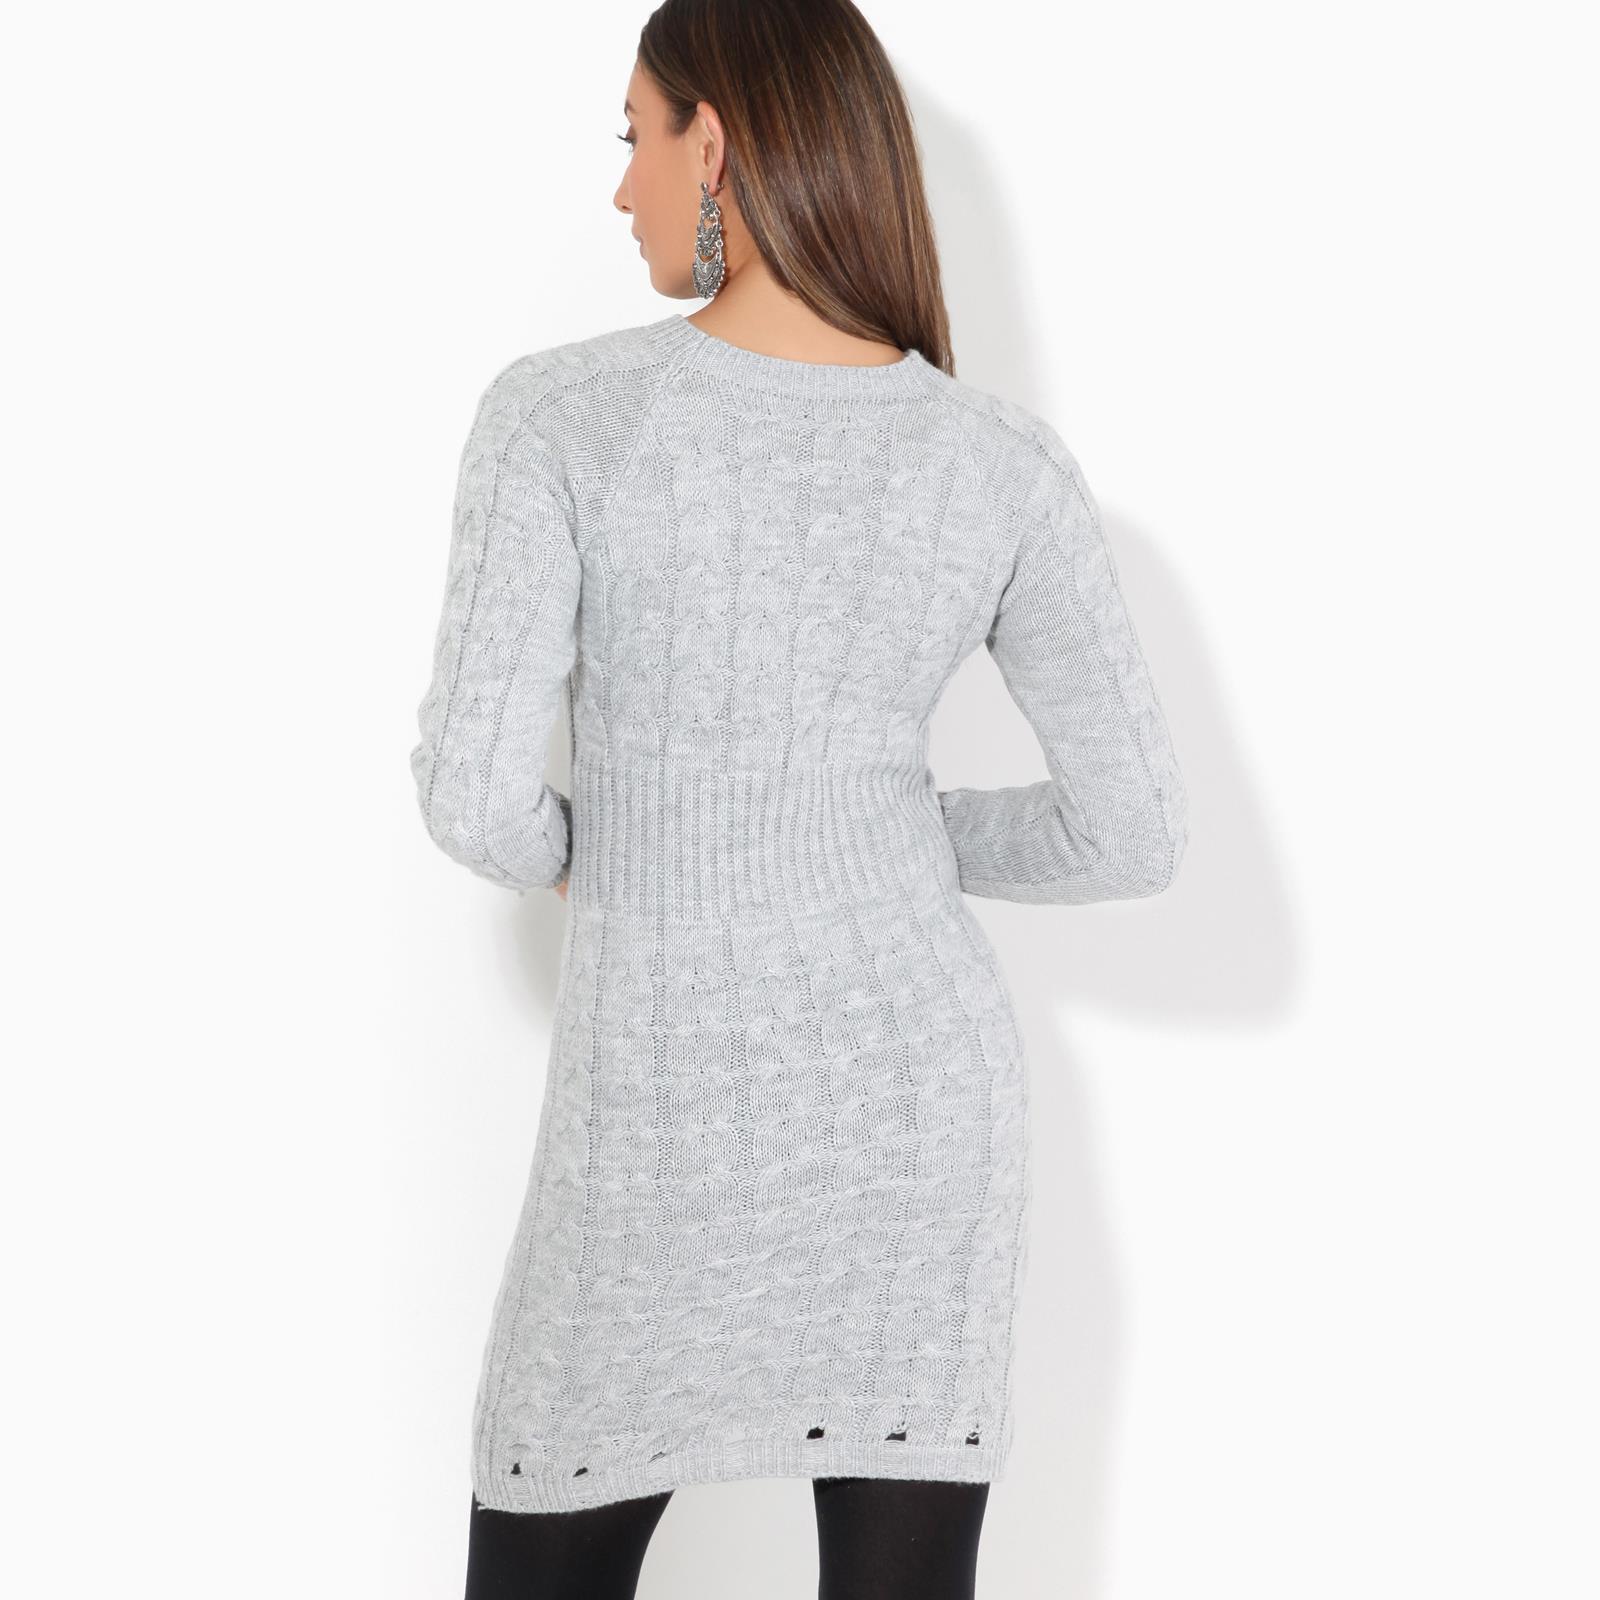 Womens-Ladies-Jumper-Dress-Longsleeve-Mini-Warm-Winter-Knit-Top-Bodycon thumbnail 13